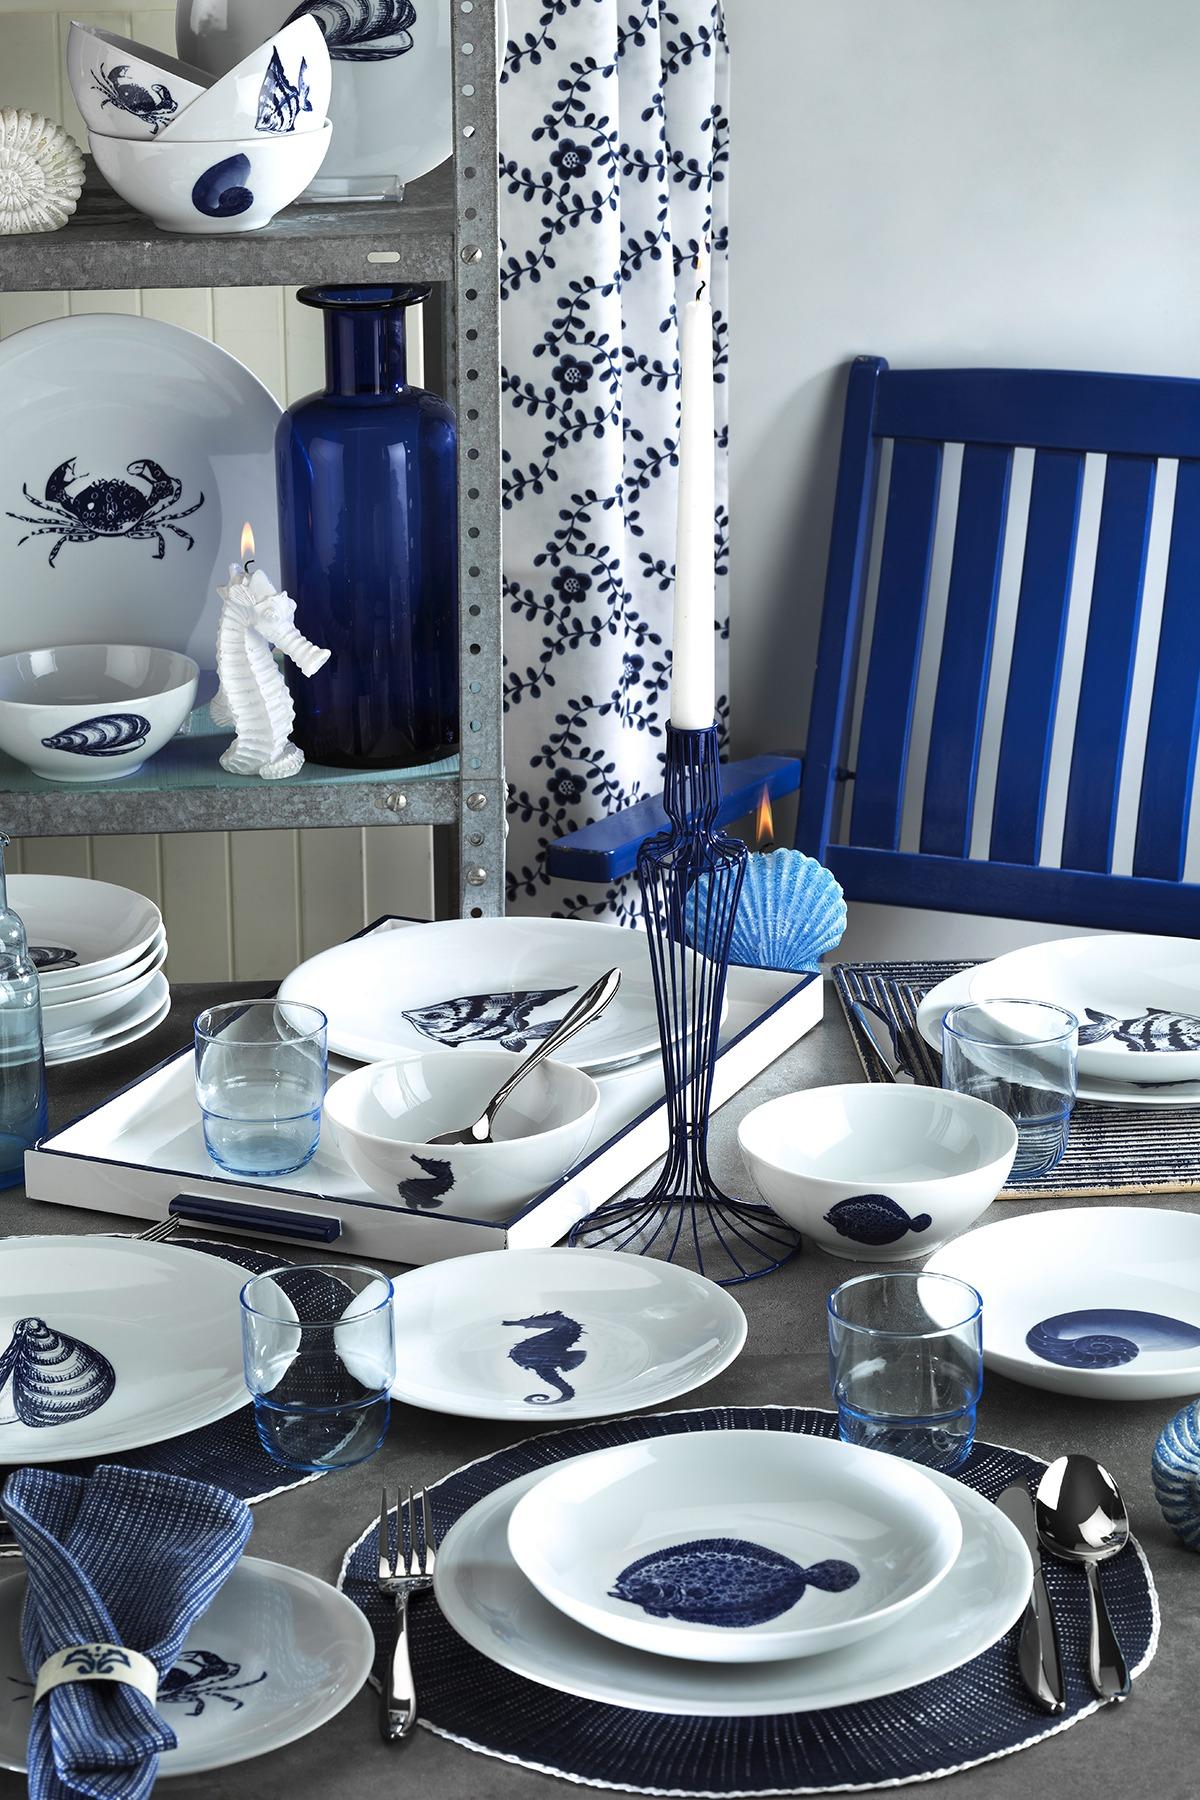 Kütahya Porselen - Kütahya Porselen Marine Serisi 24 Parça 8973 Desen Yemek Seti